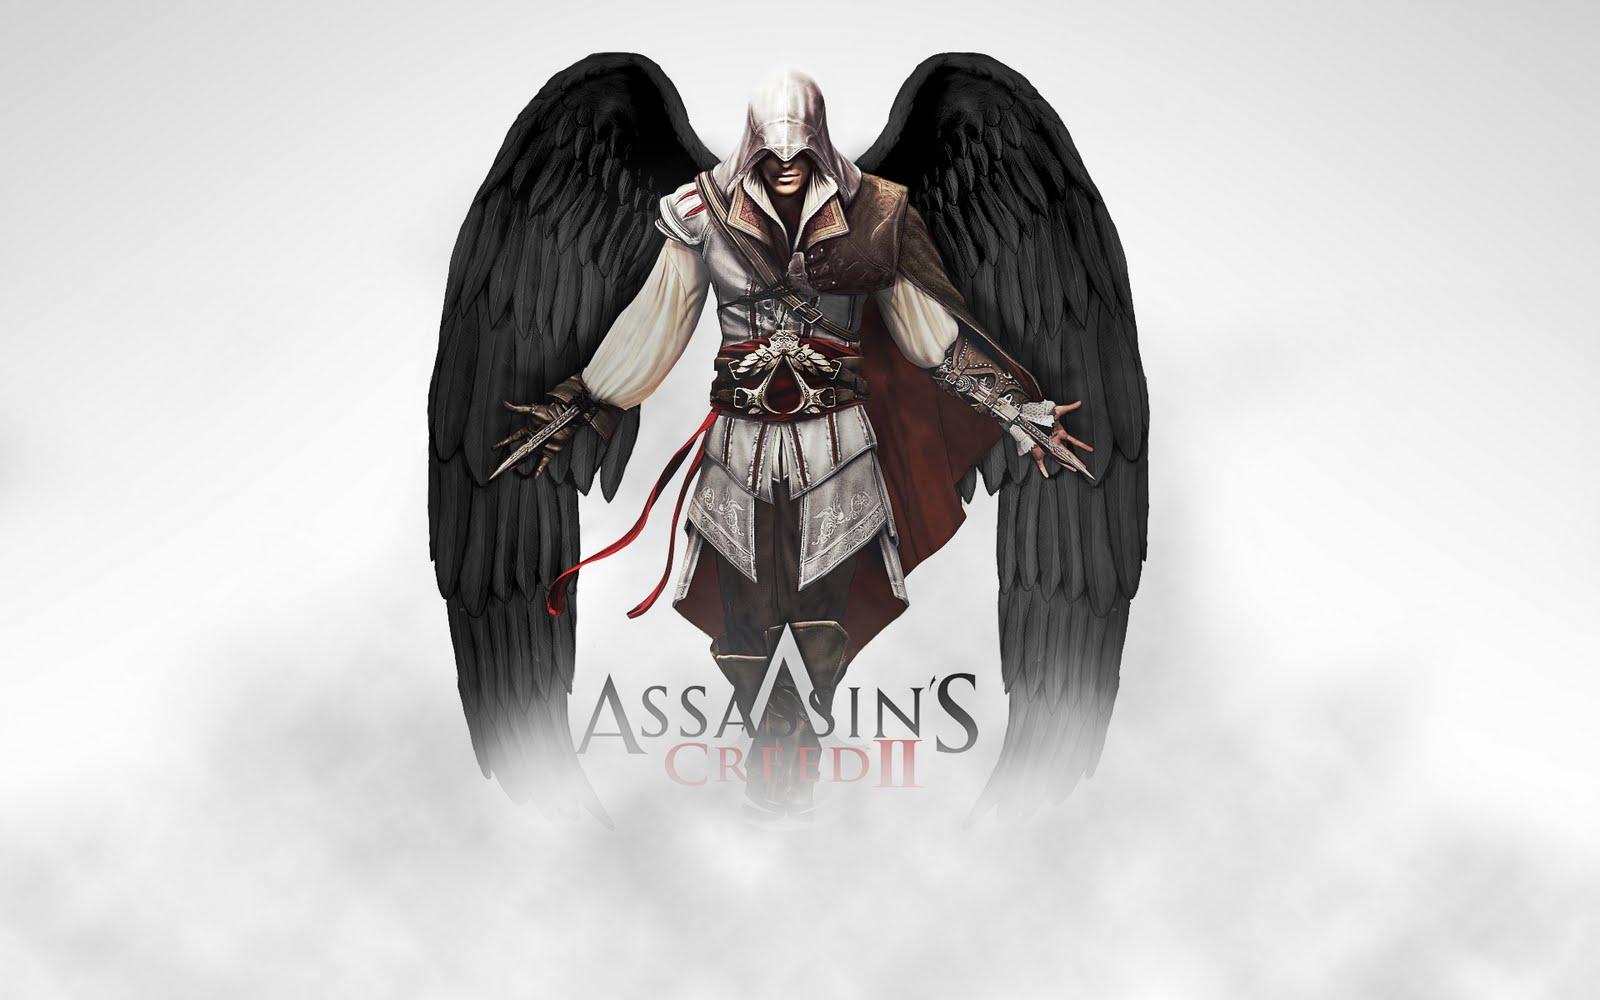 http://3.bp.blogspot.com/_j6hb7P0UBkc/TN8seyoGRRI/AAAAAAAAAD0/5d4HQsd0HsA/s1600/Assassins_Creed_2_Ezio_Simple_by_b4ttery.jpg